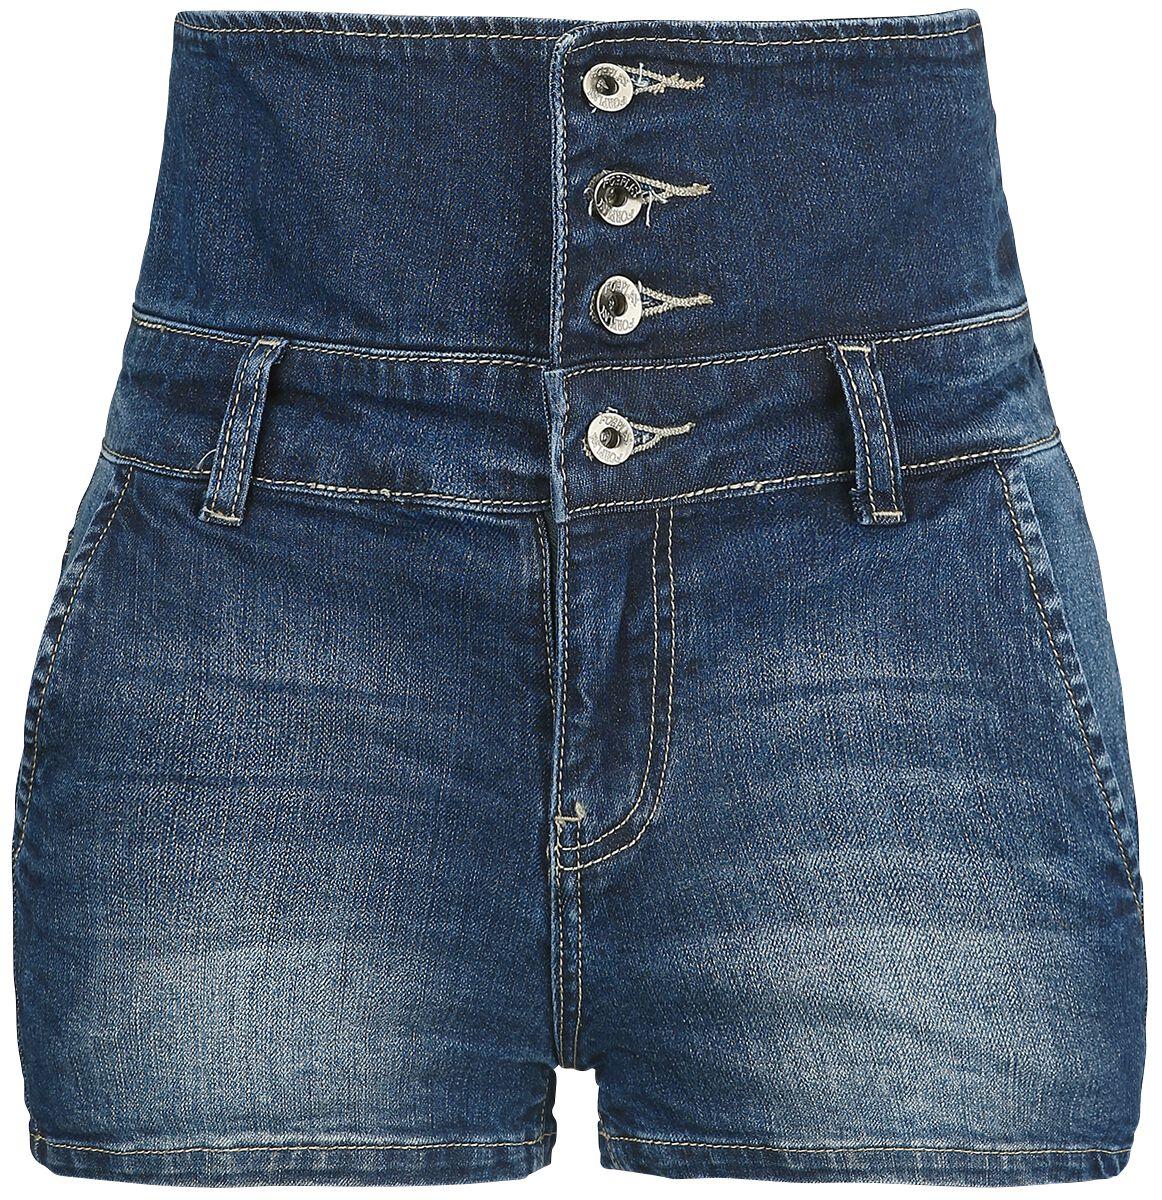 Image of   Forplay High Waist Denim Hot Pant Girlie hotpants blå